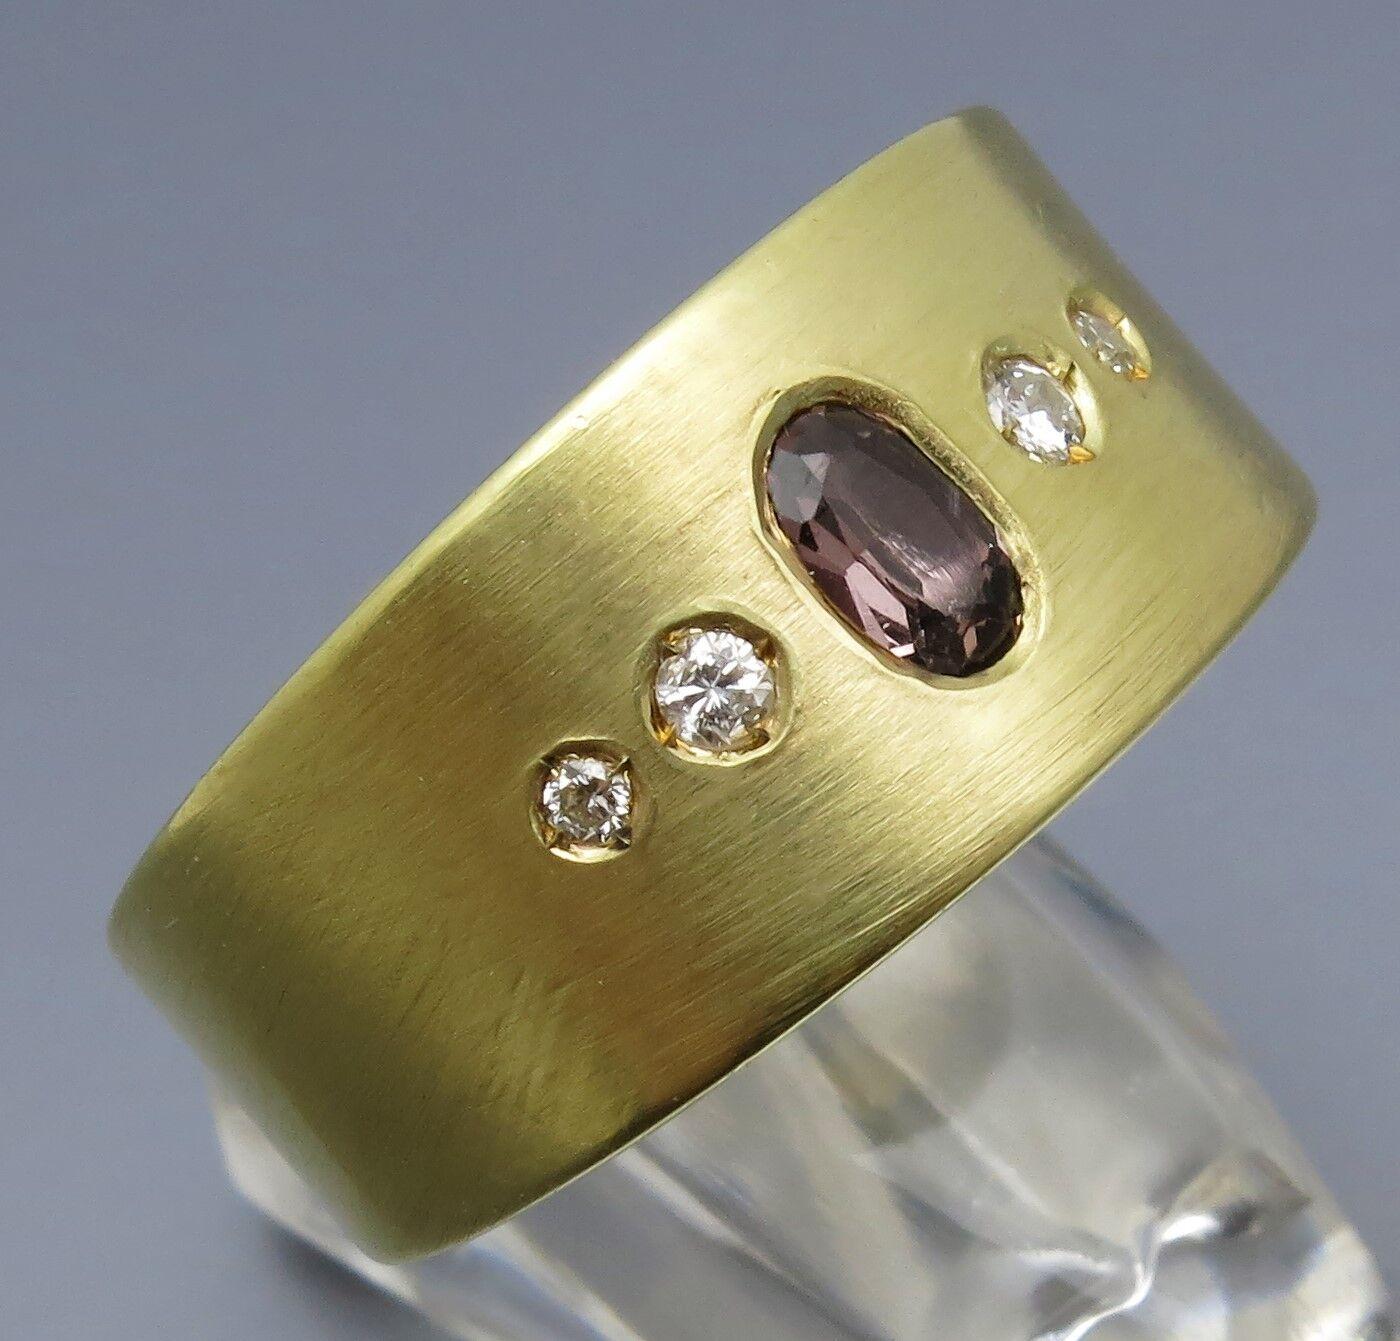 Maturo-Design-eleganti Safir Diamante - 999 999 999 finemente argentoo giallo-dorato 0f3582